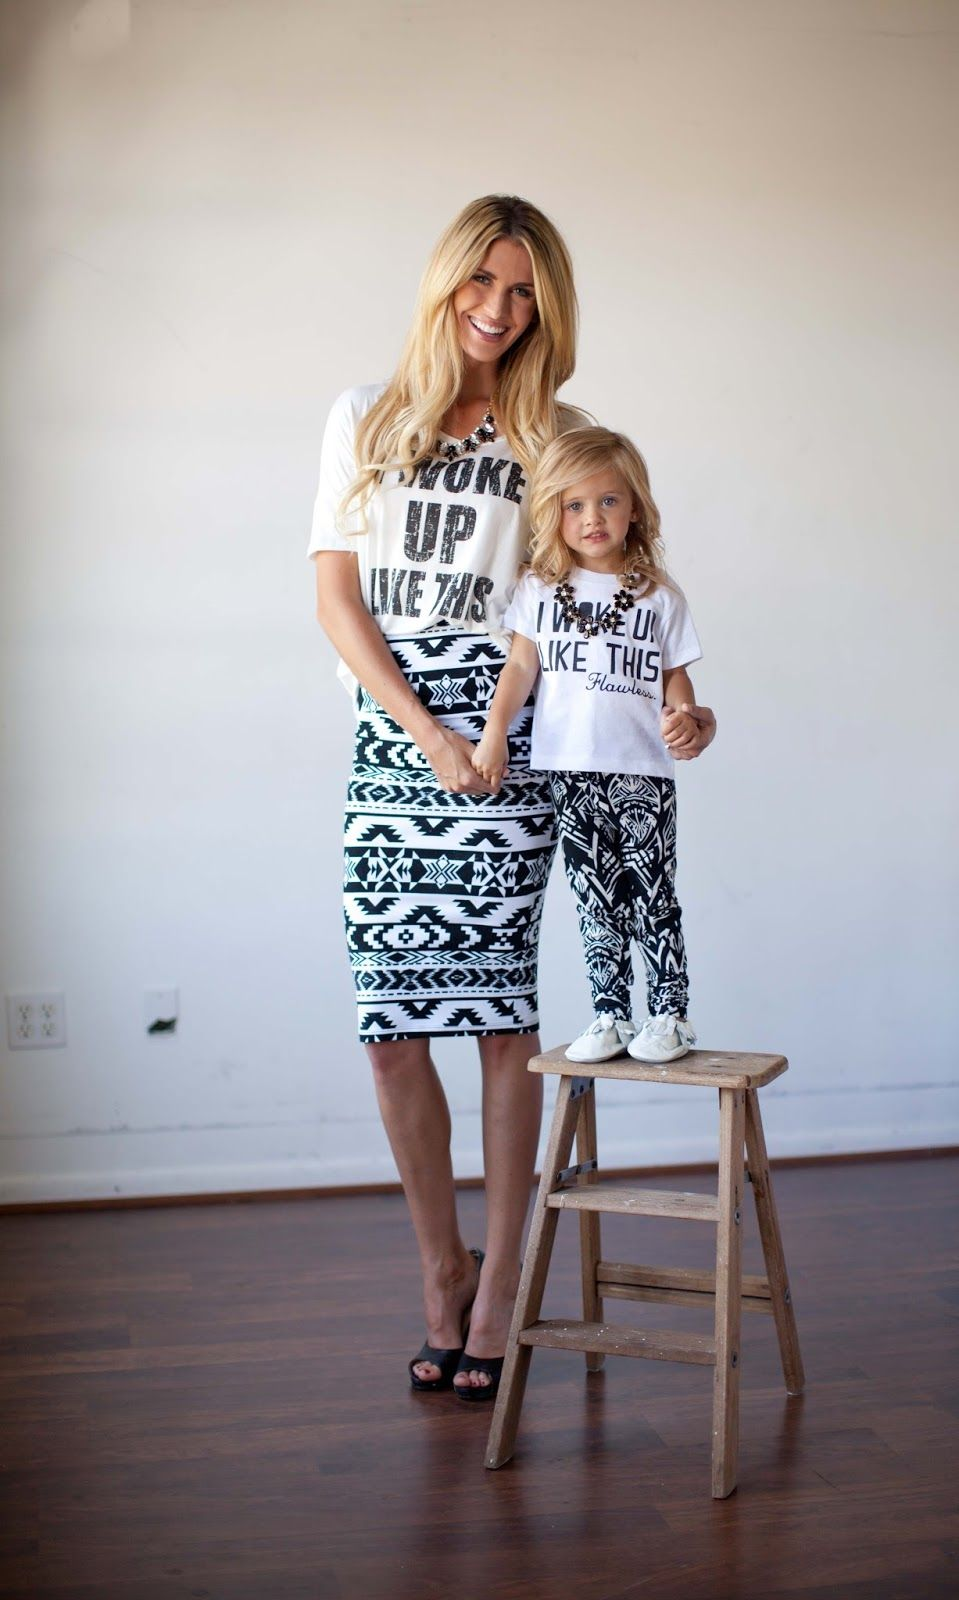 a470a3069920a بالصور: أجمل إطلالات الأمهات مع بناتهن بنفس الملابس | My Style ...